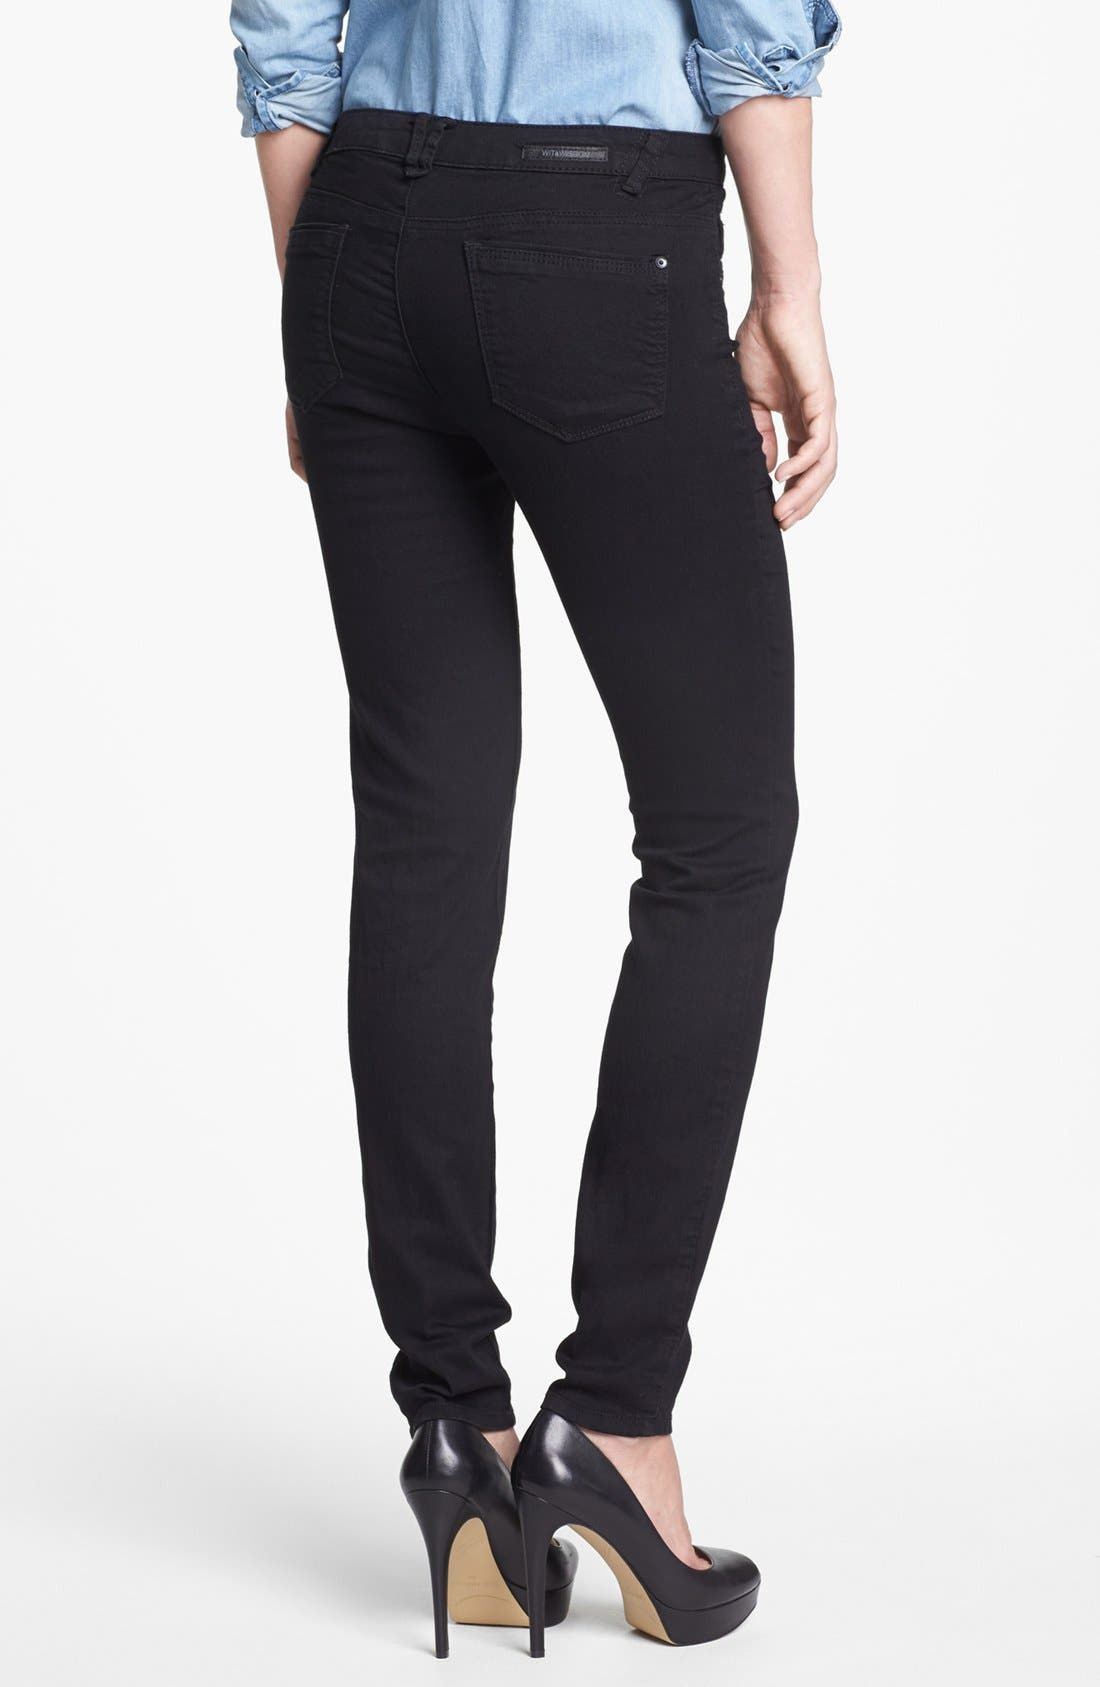 Alternate Image 2  - Wit & Wisdom Skinny Jeans (Black) (Nordstrom Exclusive)